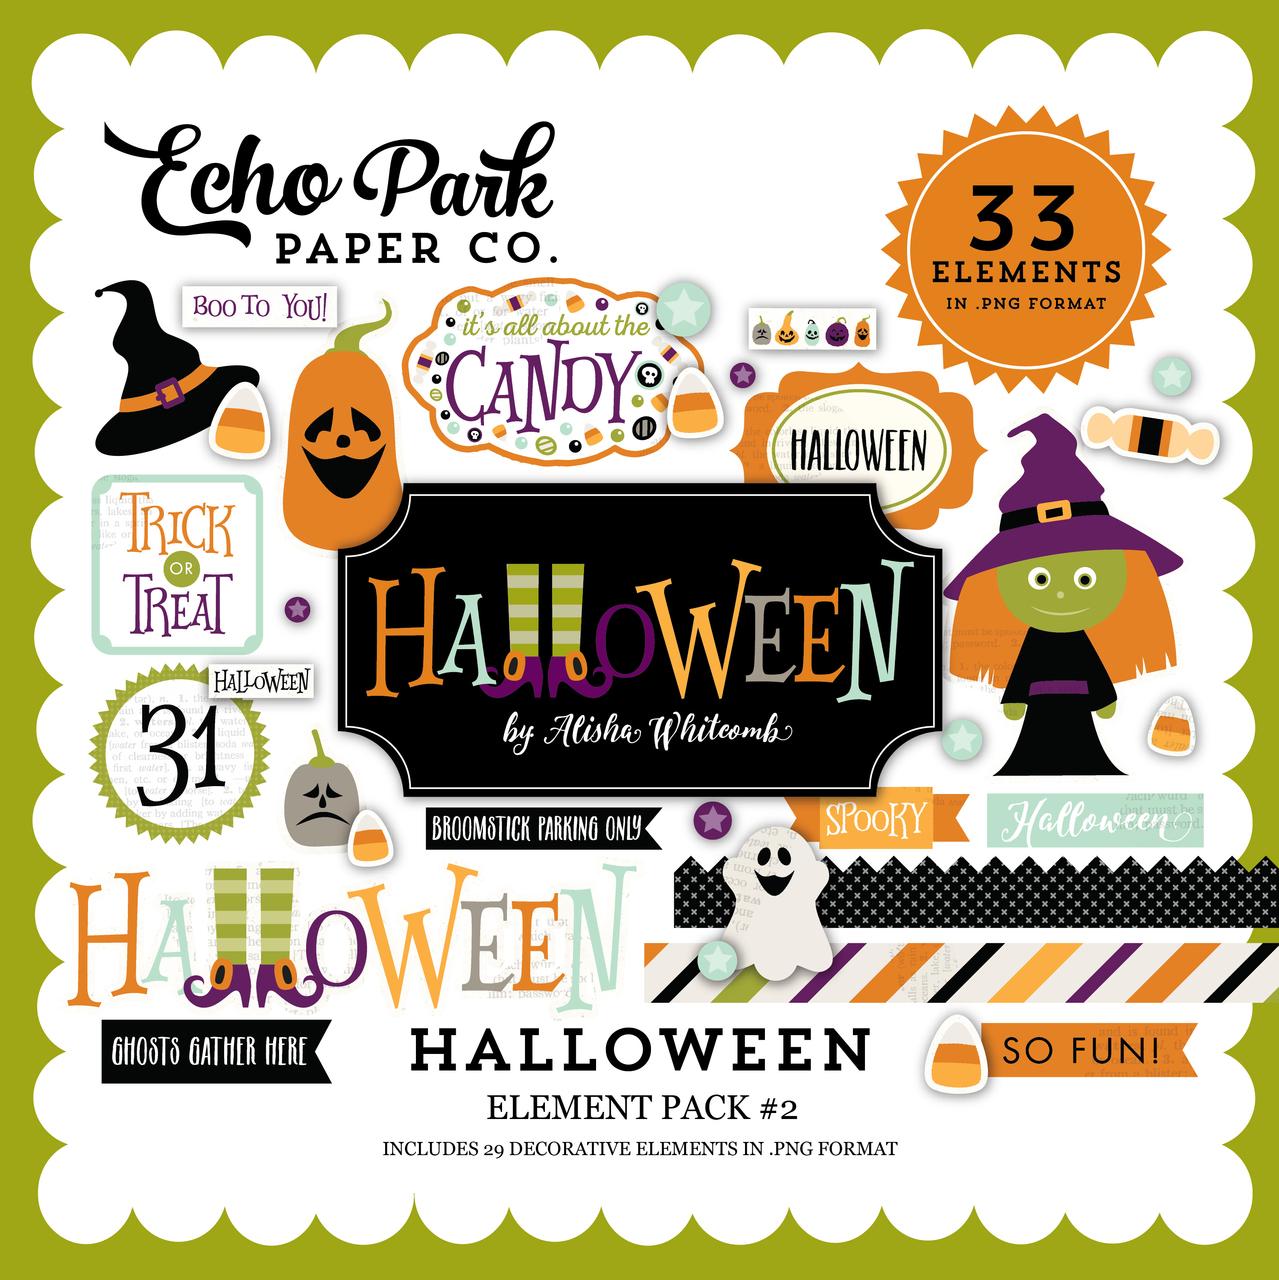 Halloween Element Pack #2